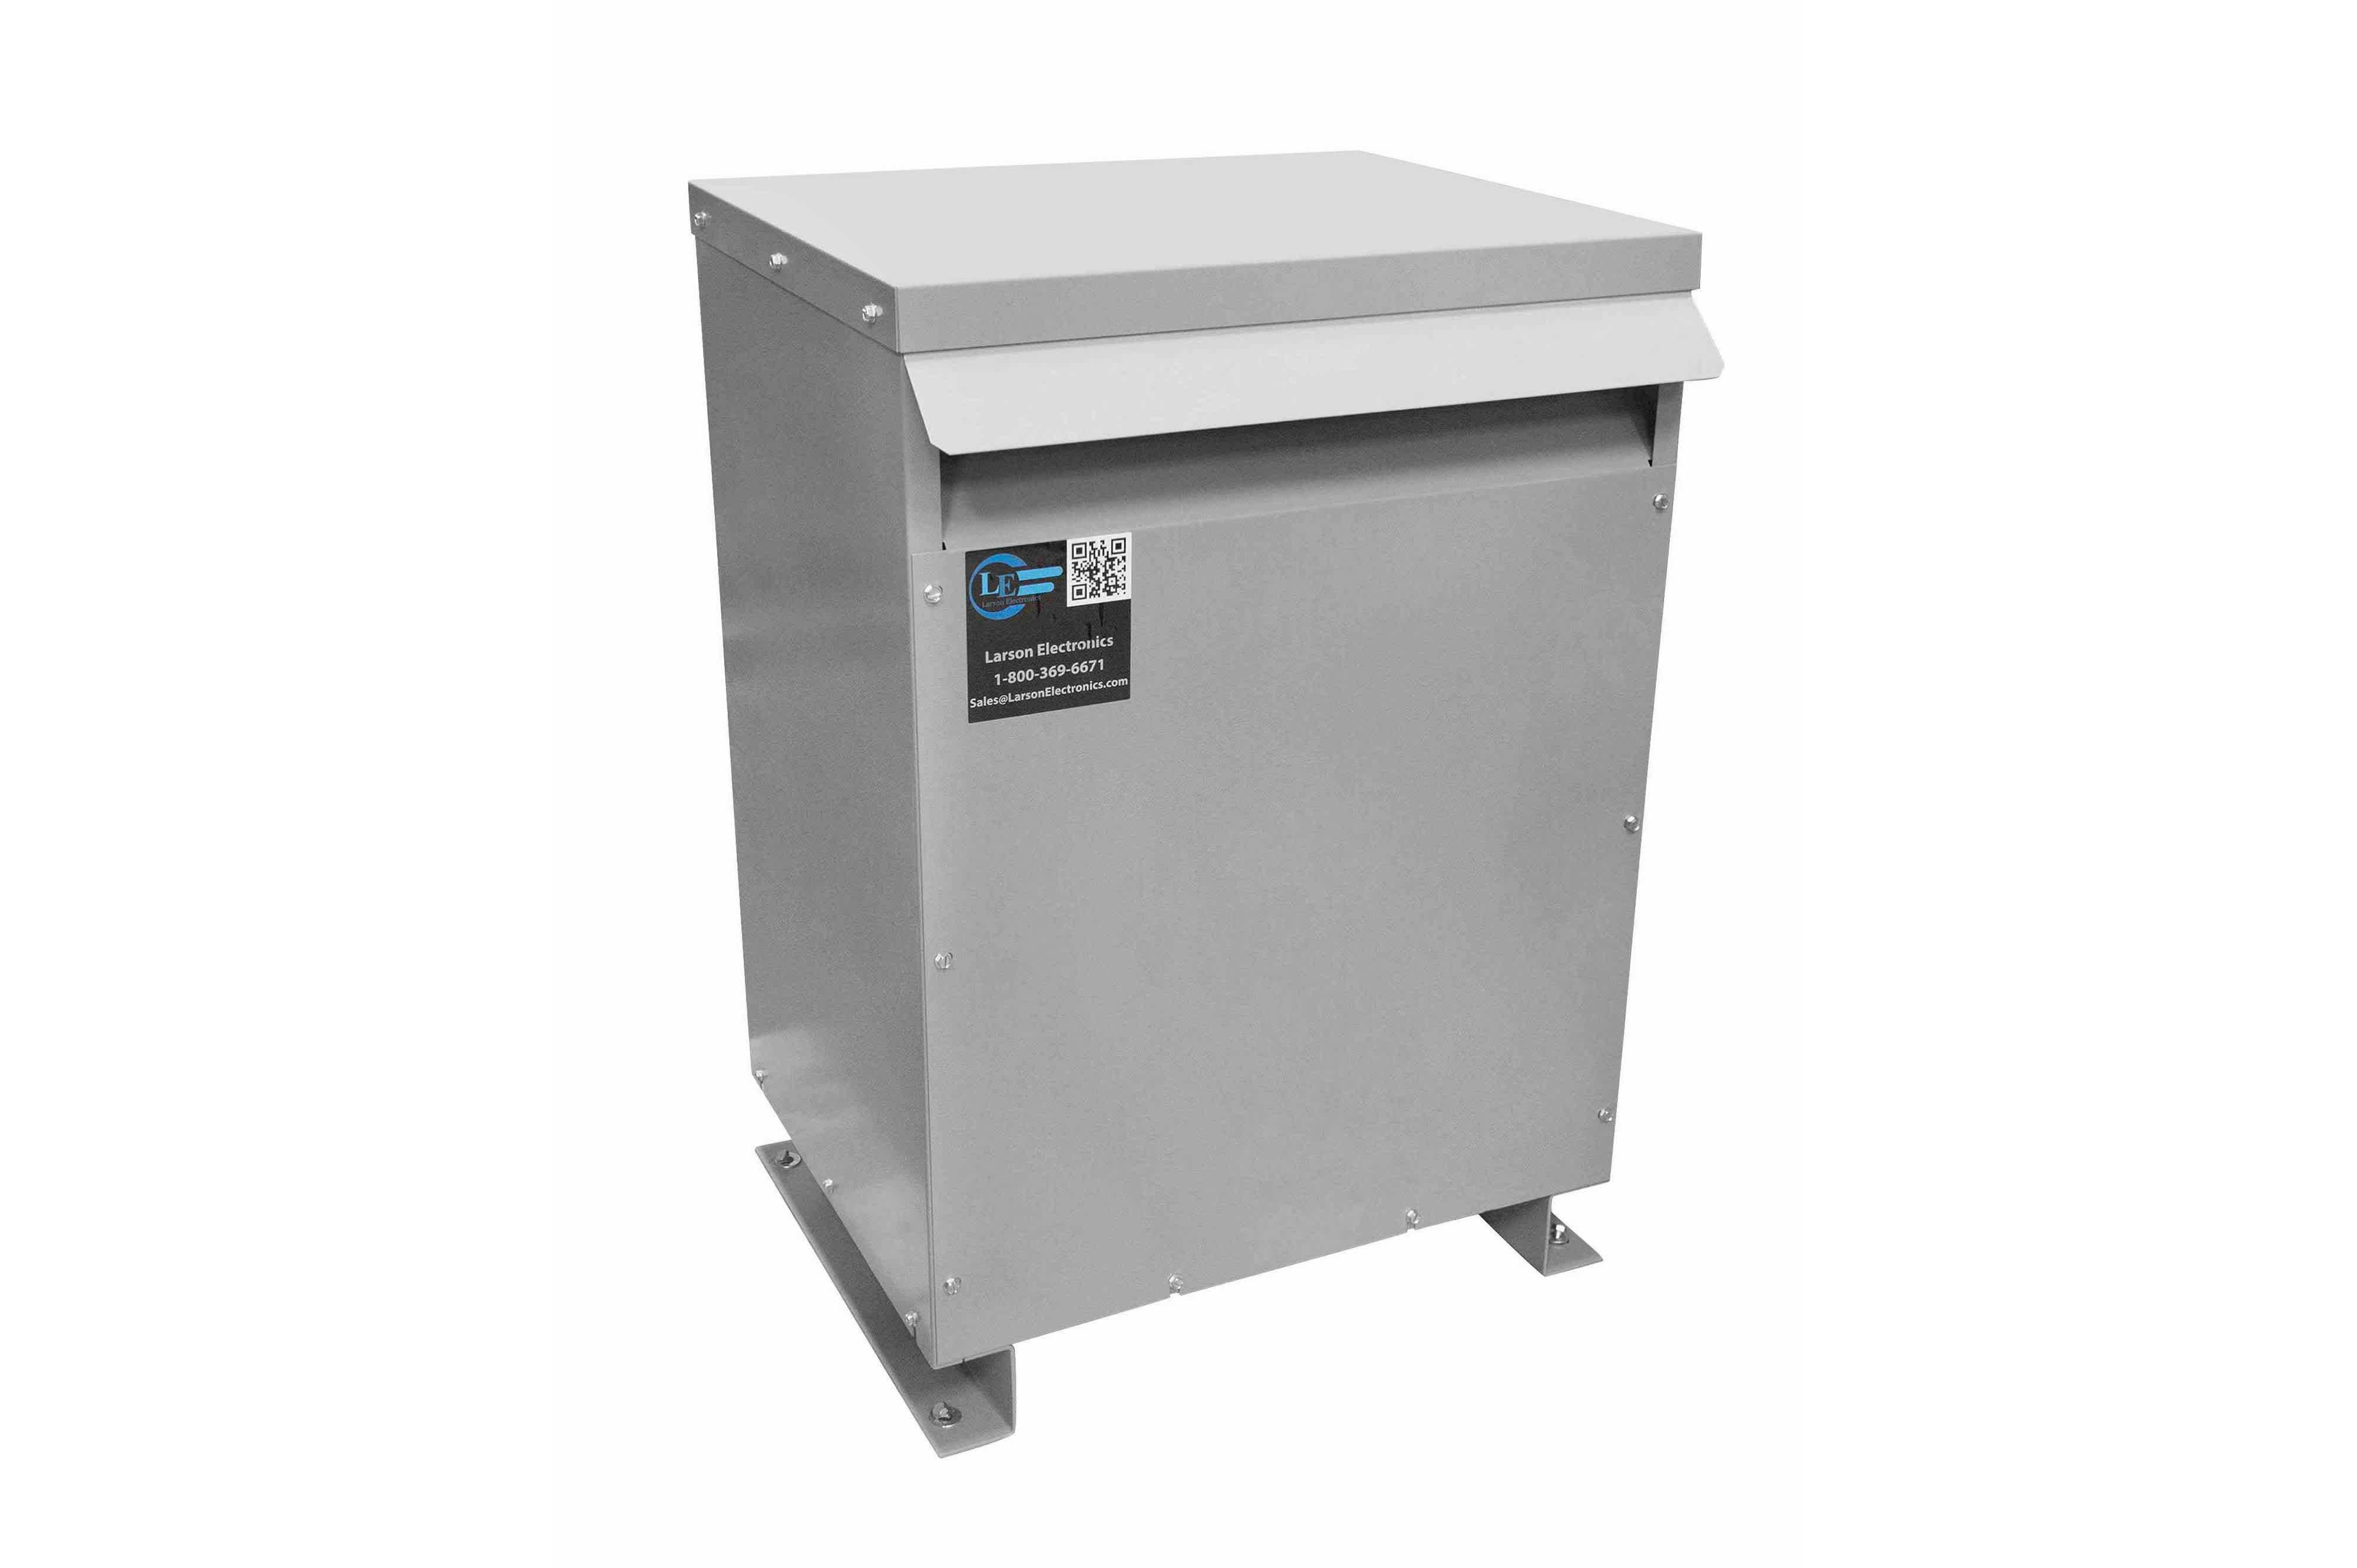 65 kVA 3PH Isolation Transformer, 480V Wye Primary, 380Y/220 Wye-N Secondary, N3R, Ventilated, 60 Hz